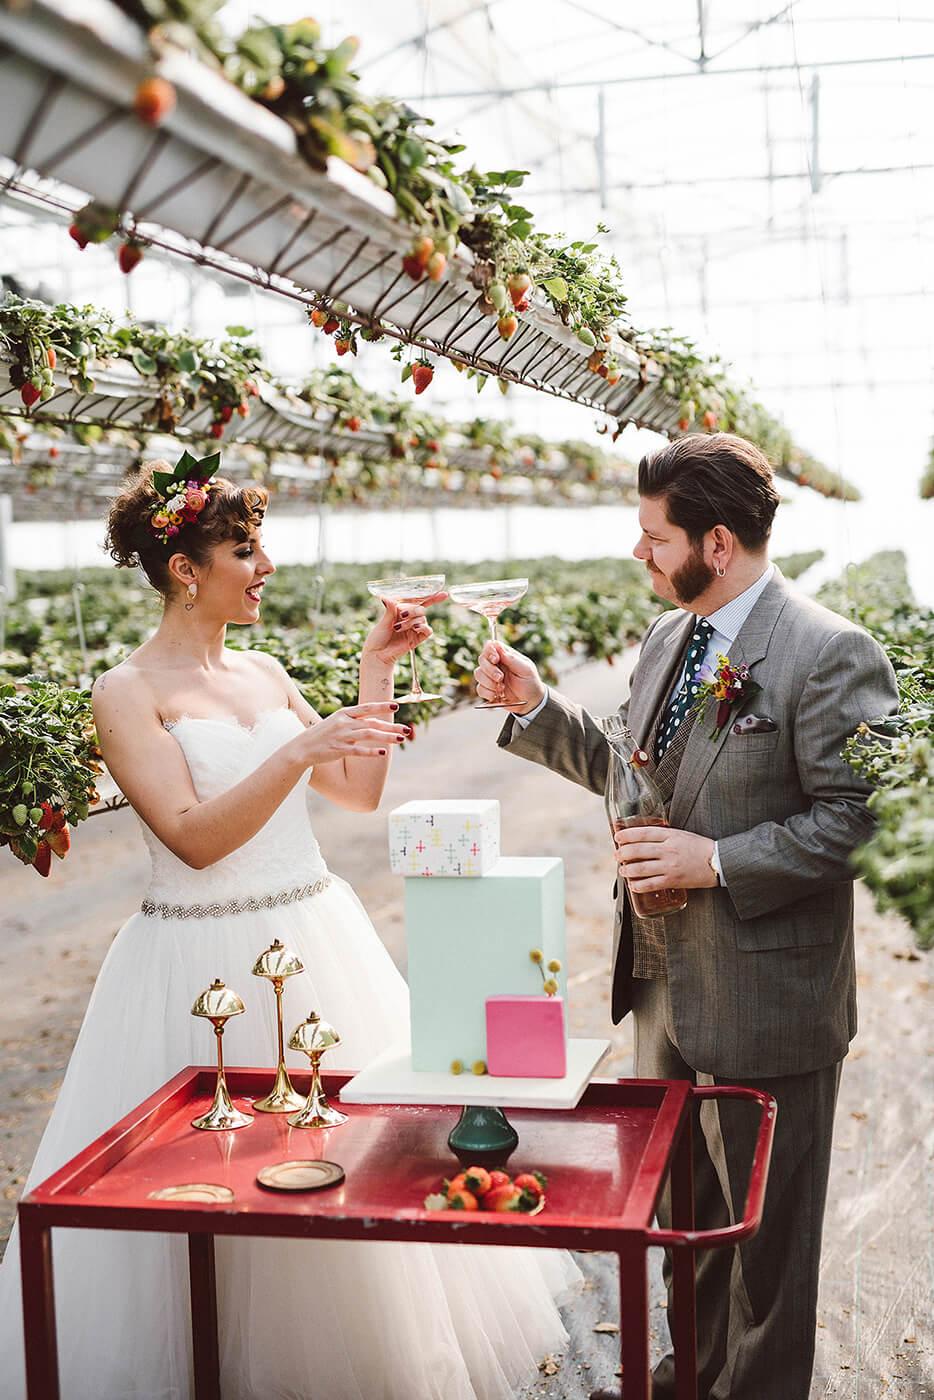 roma-organizacao-eventos-editorial-mid-century-modern-wedding-in-a-strawberry-field-28